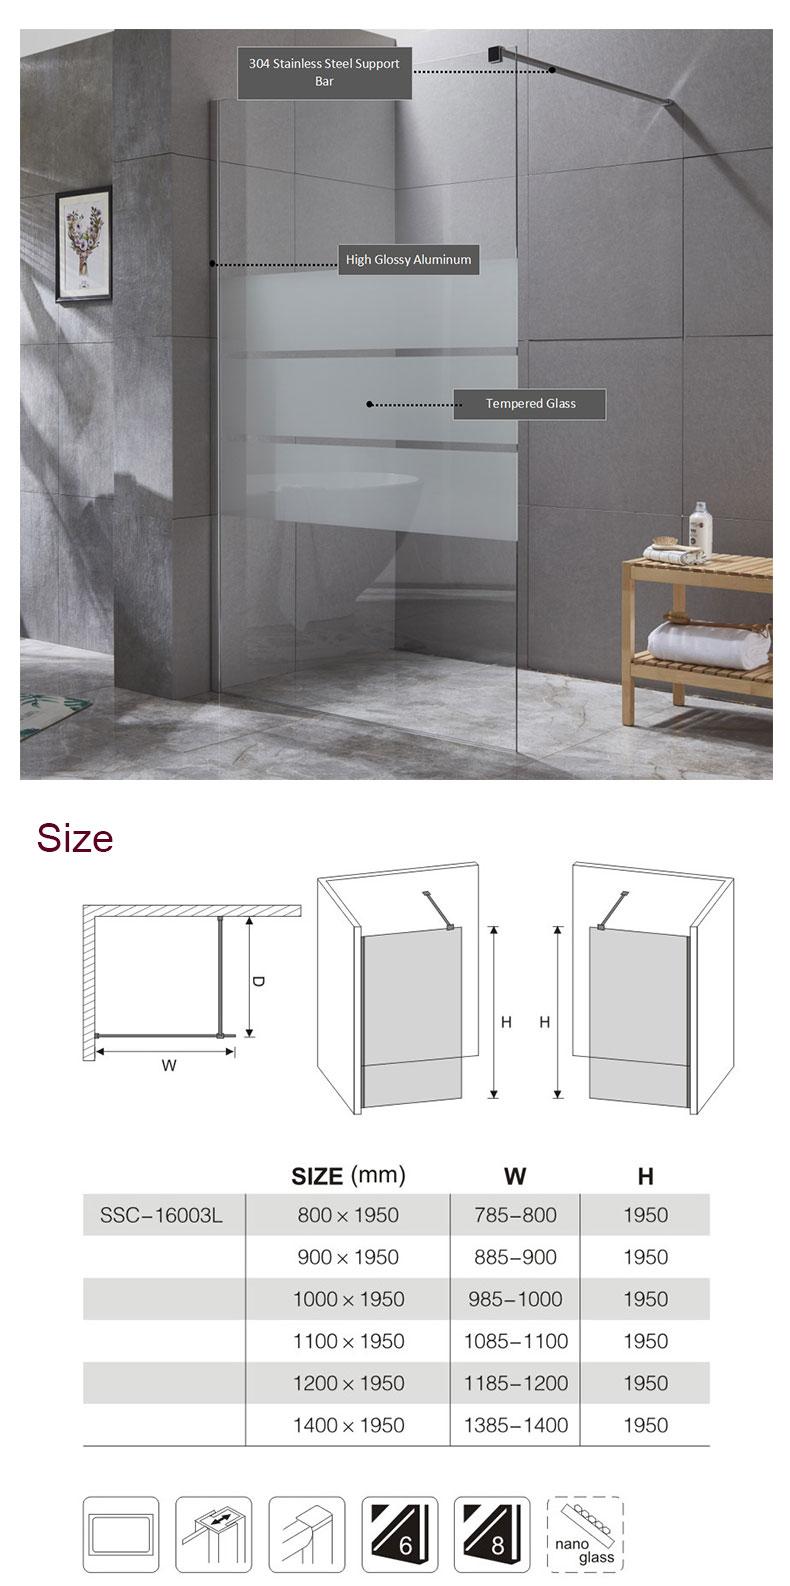 Safty Glass Walk-in Shower Enclosure manufacturers